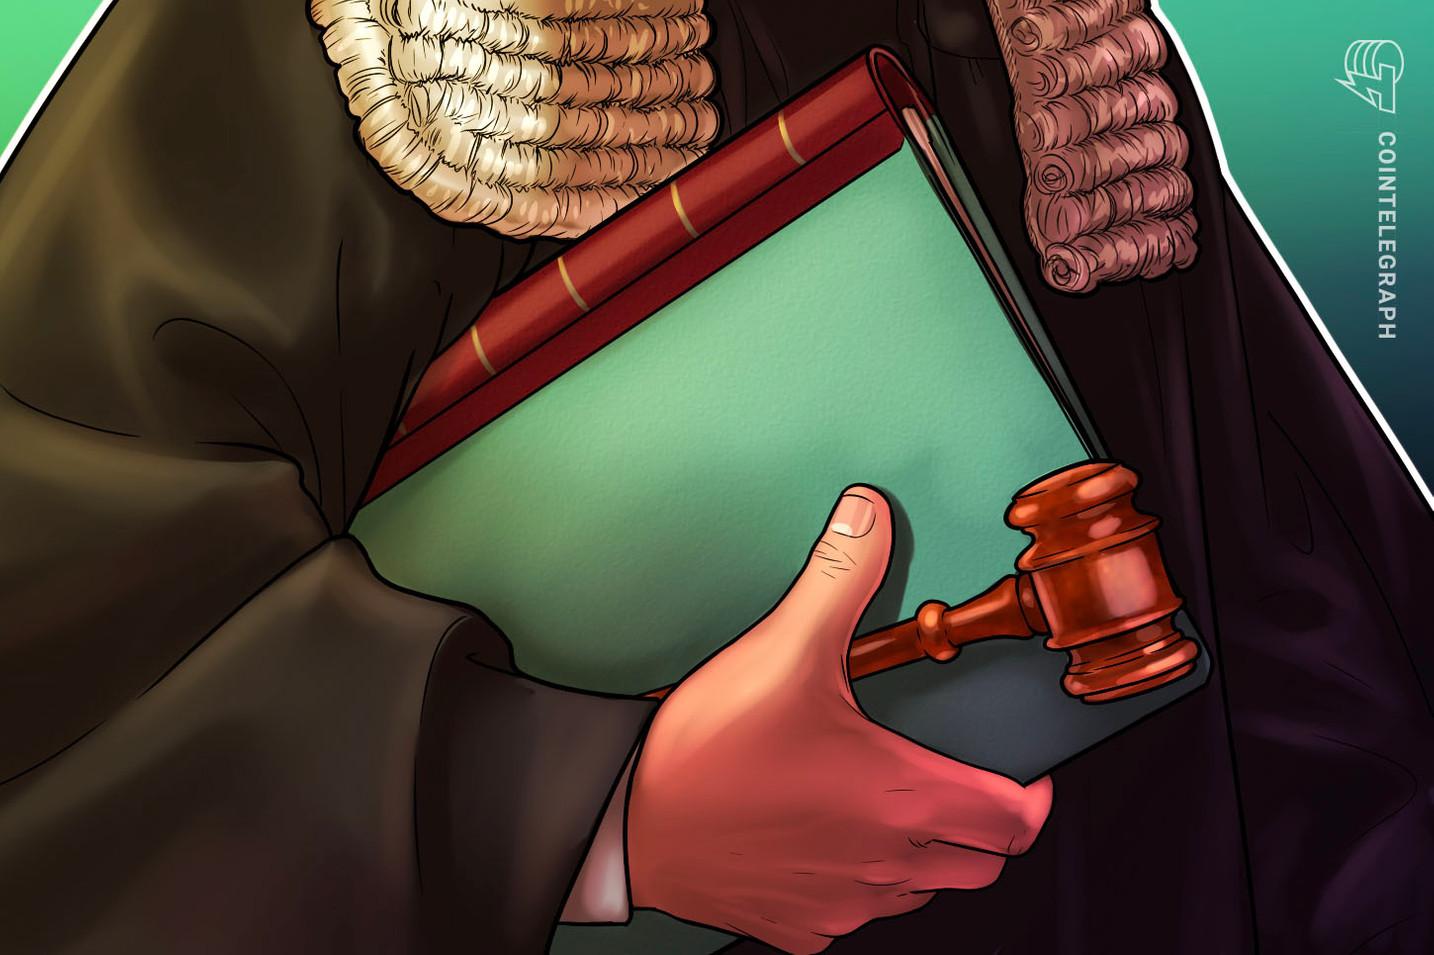 Alleged $3.6B crypto Ponzi's 'victims' still believe the exchange is legit